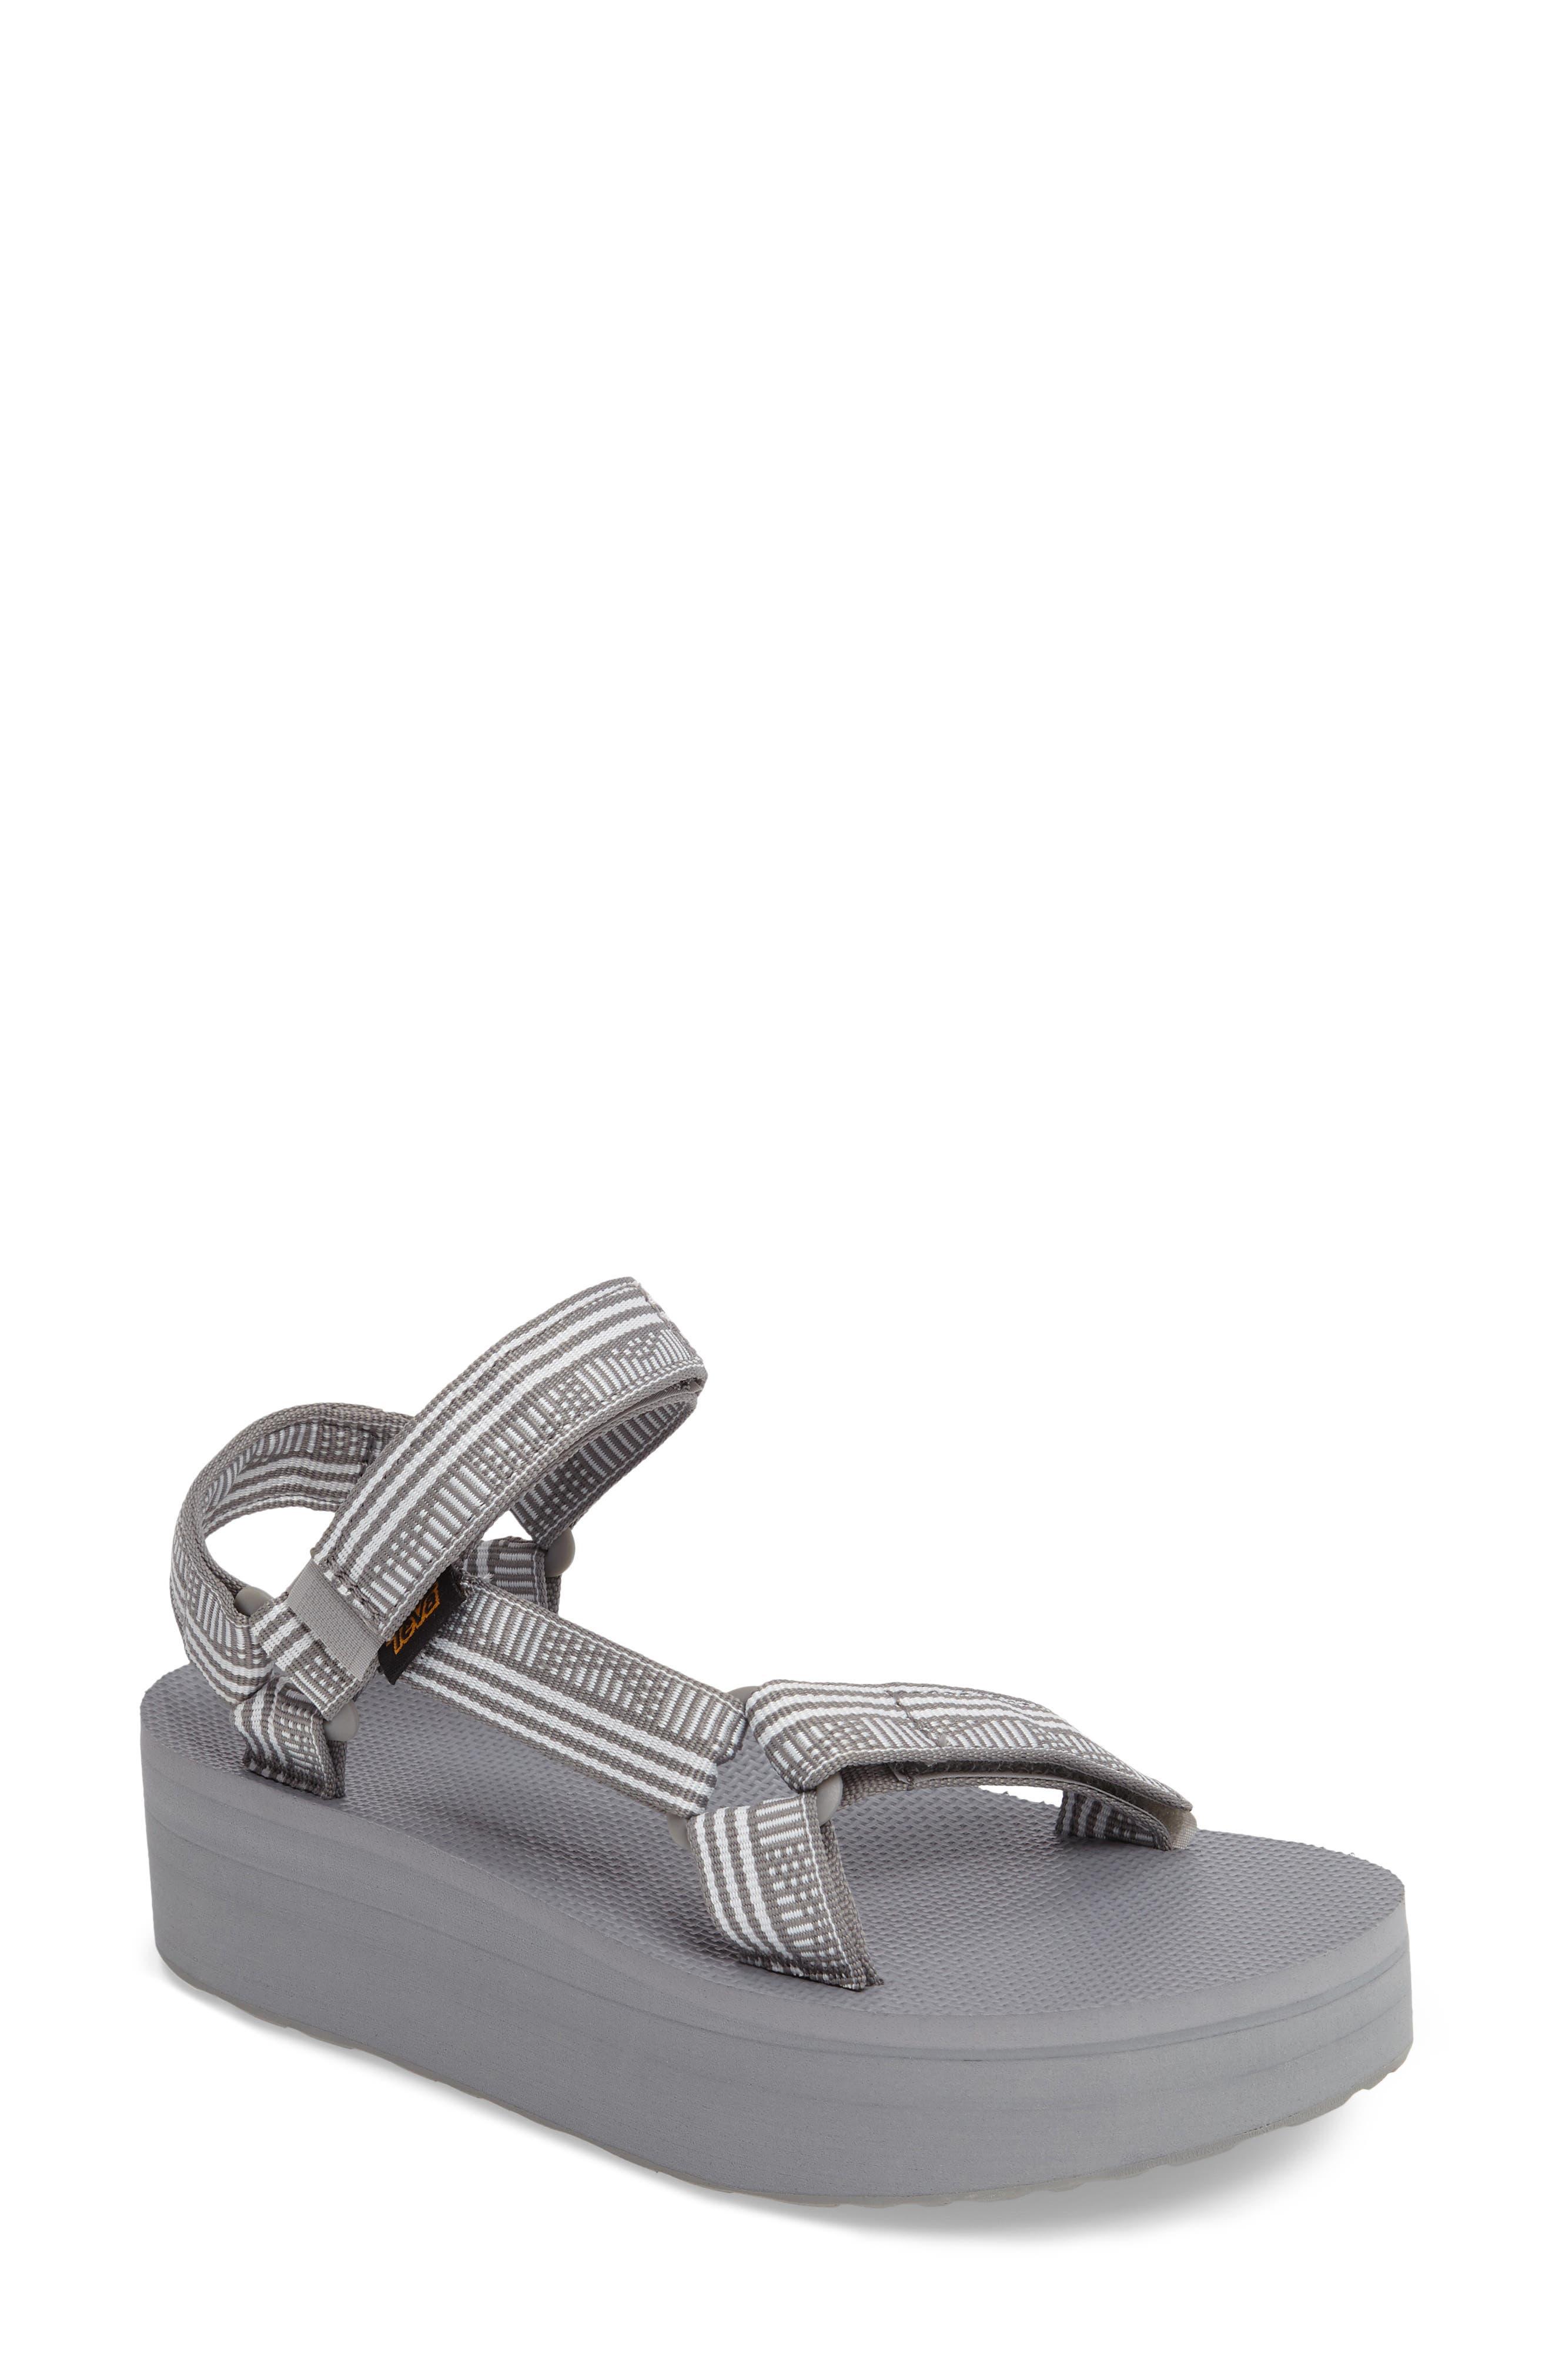 Main Image - Teva 'Universal' Flatform Sandal (Women)